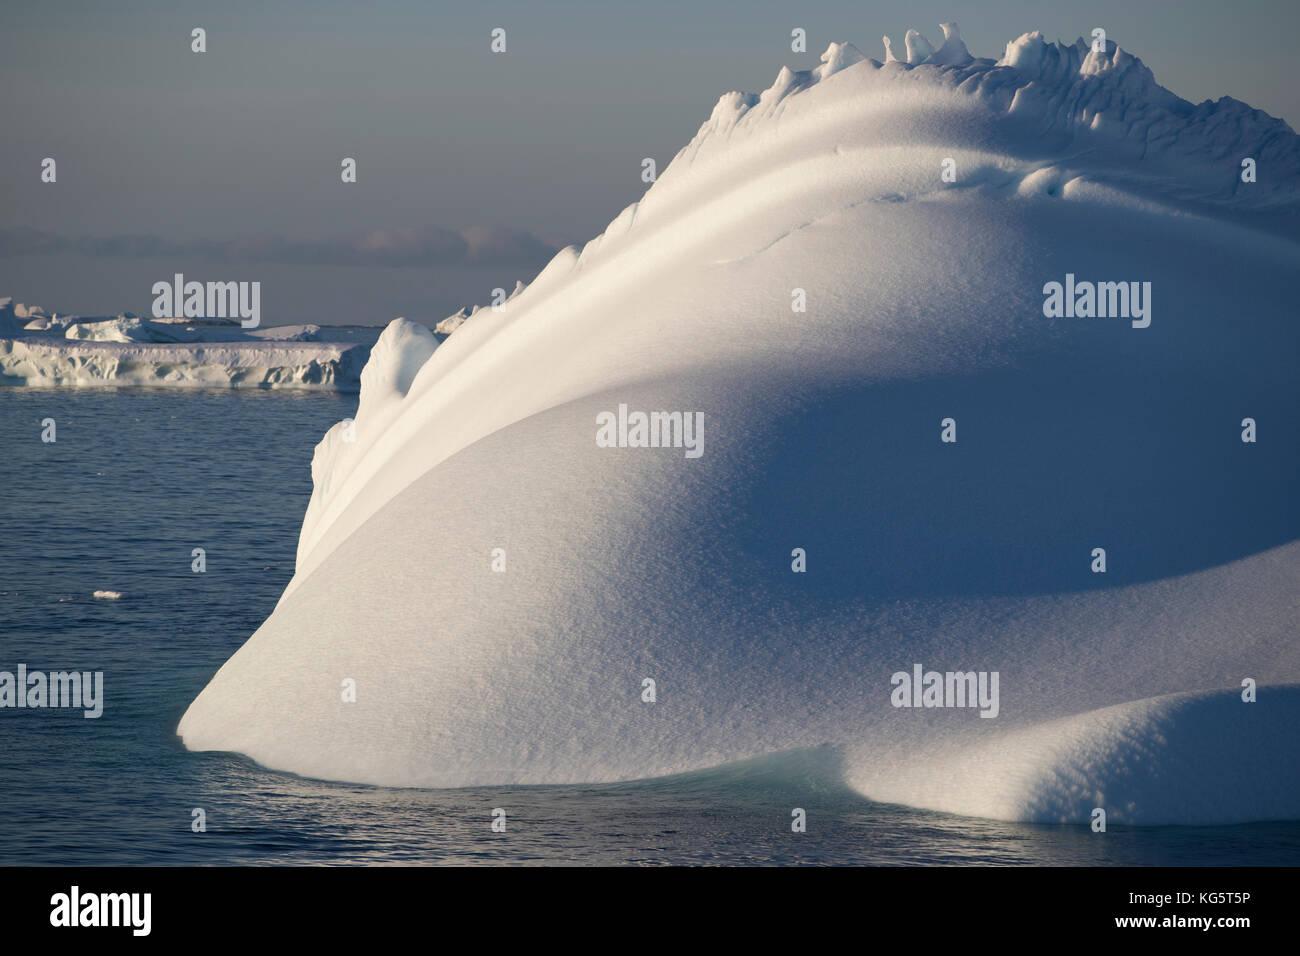 Sculptural looking iceberg, Antarctica - Stock Image